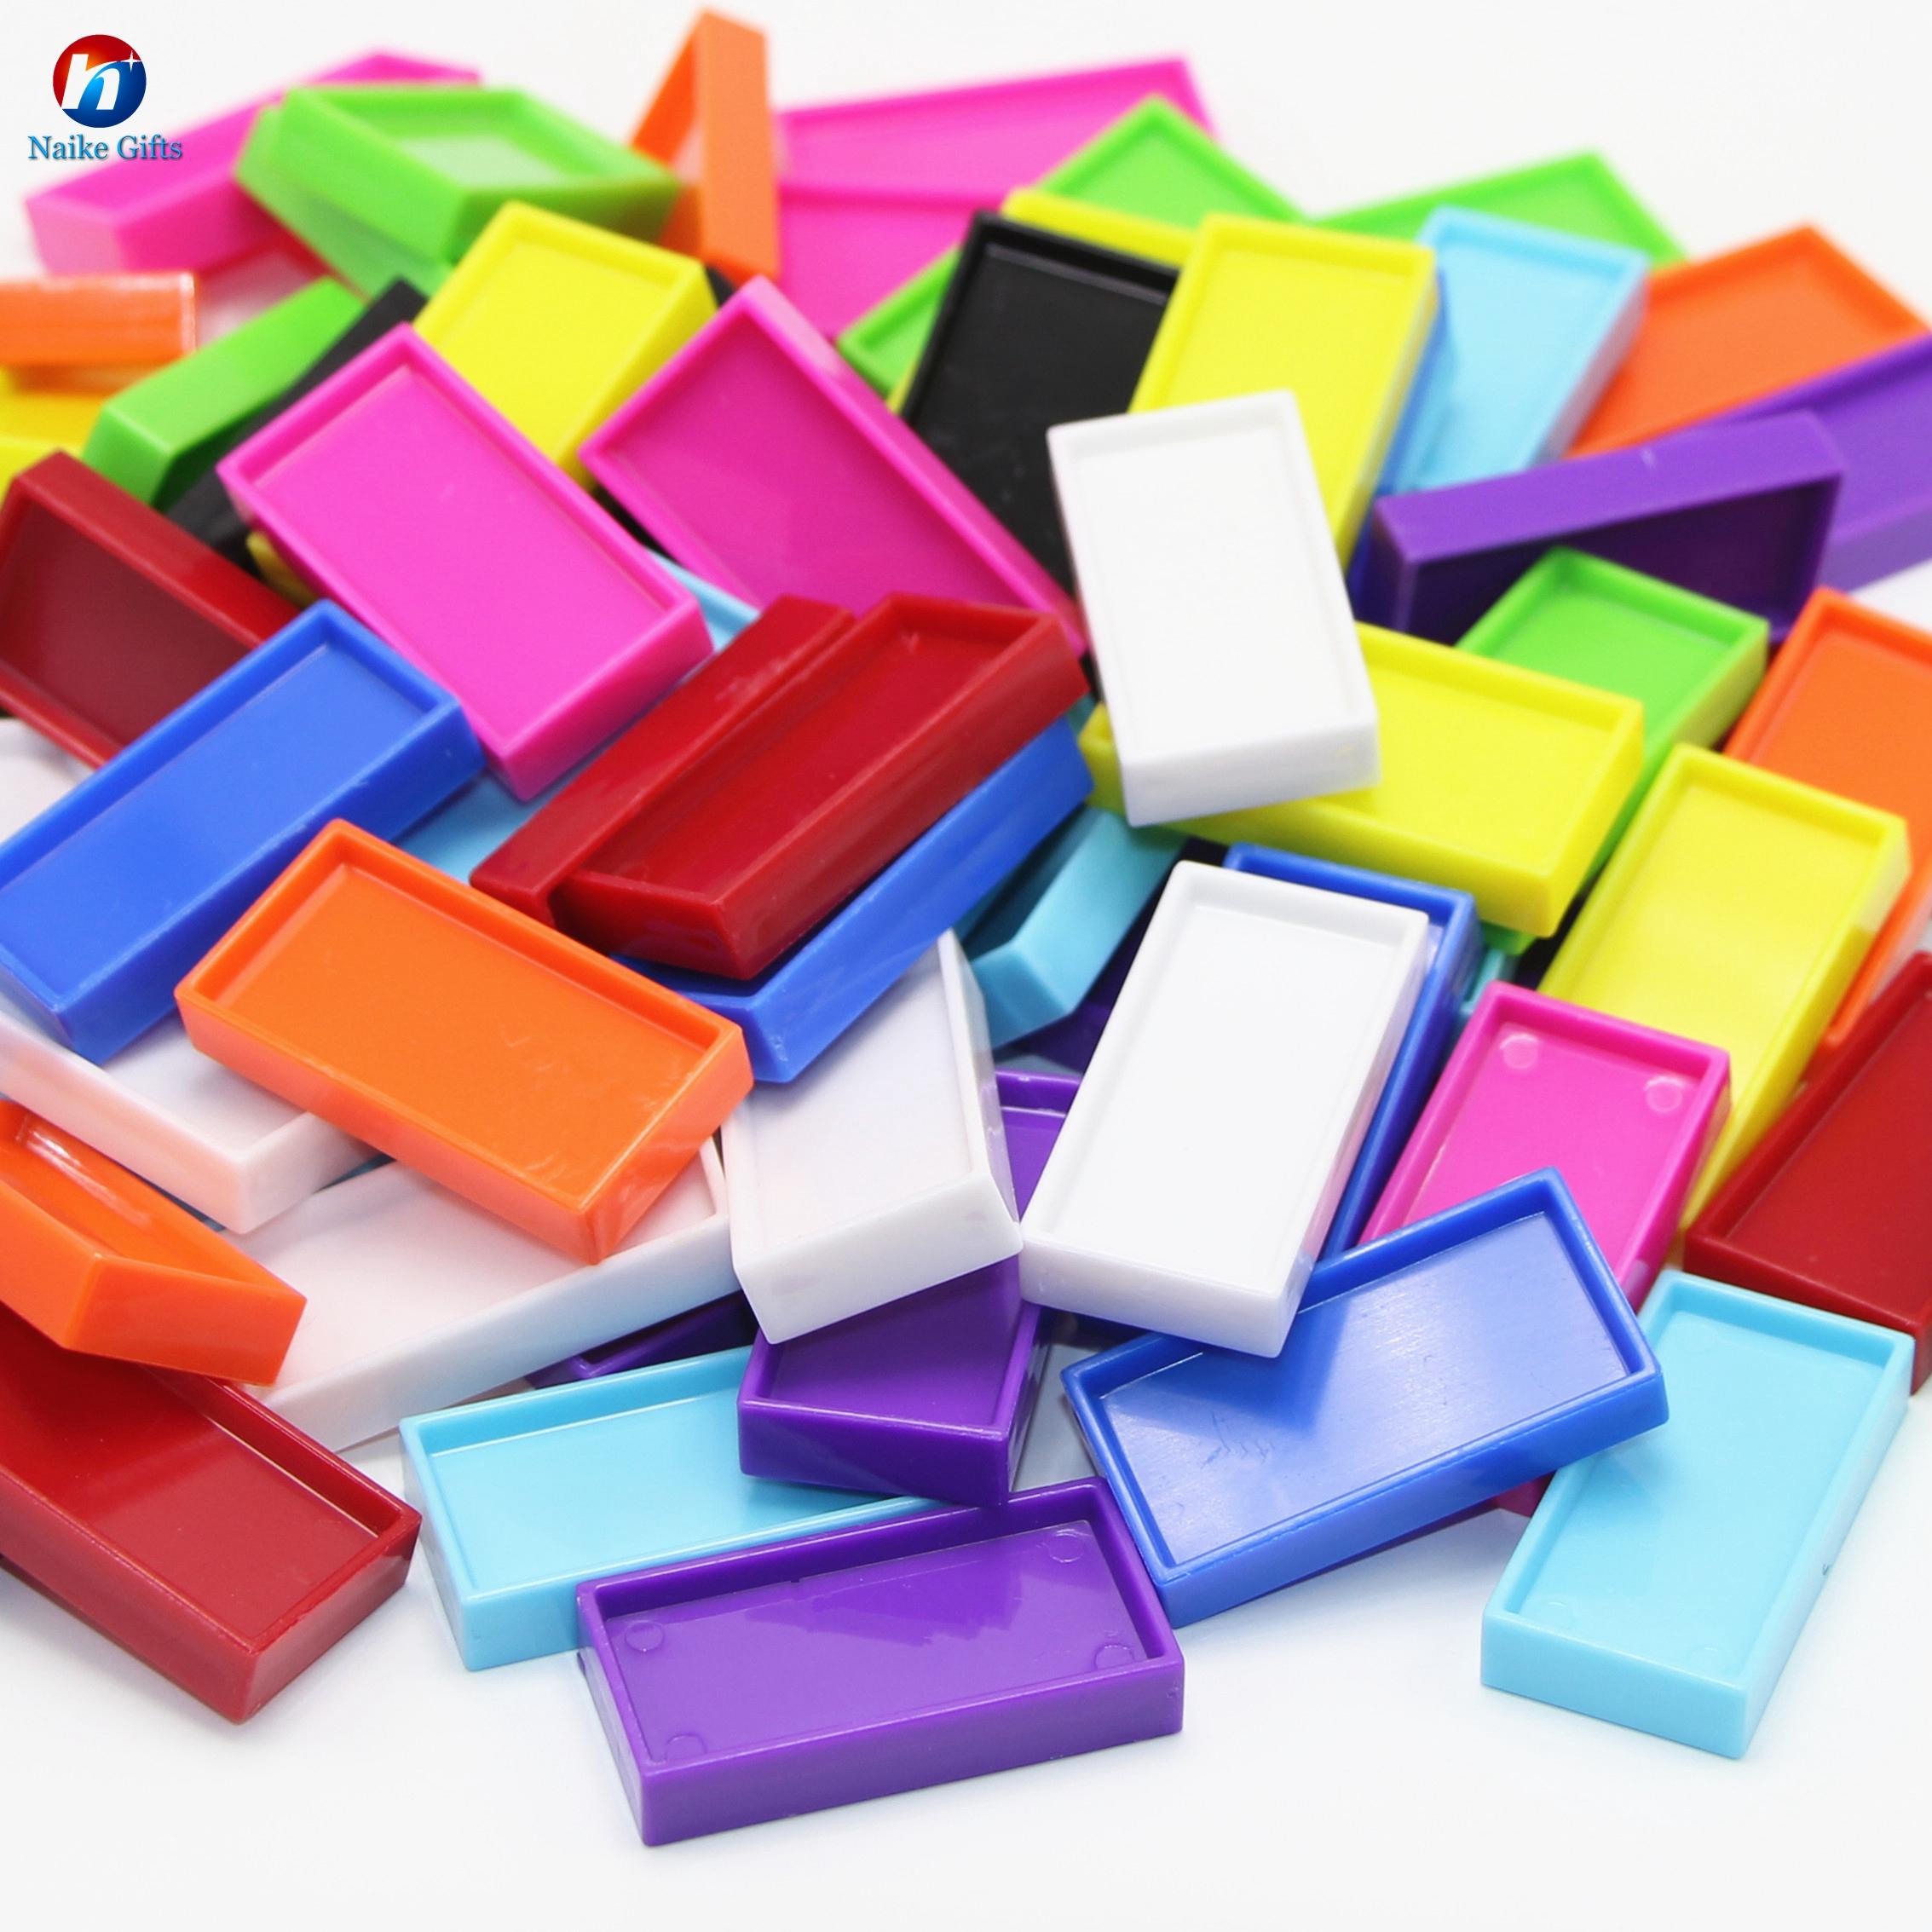 Grossiste Dominos À Imprimer-Acheter Les Meilleurs Dominos À tout Dominos À Imprimer